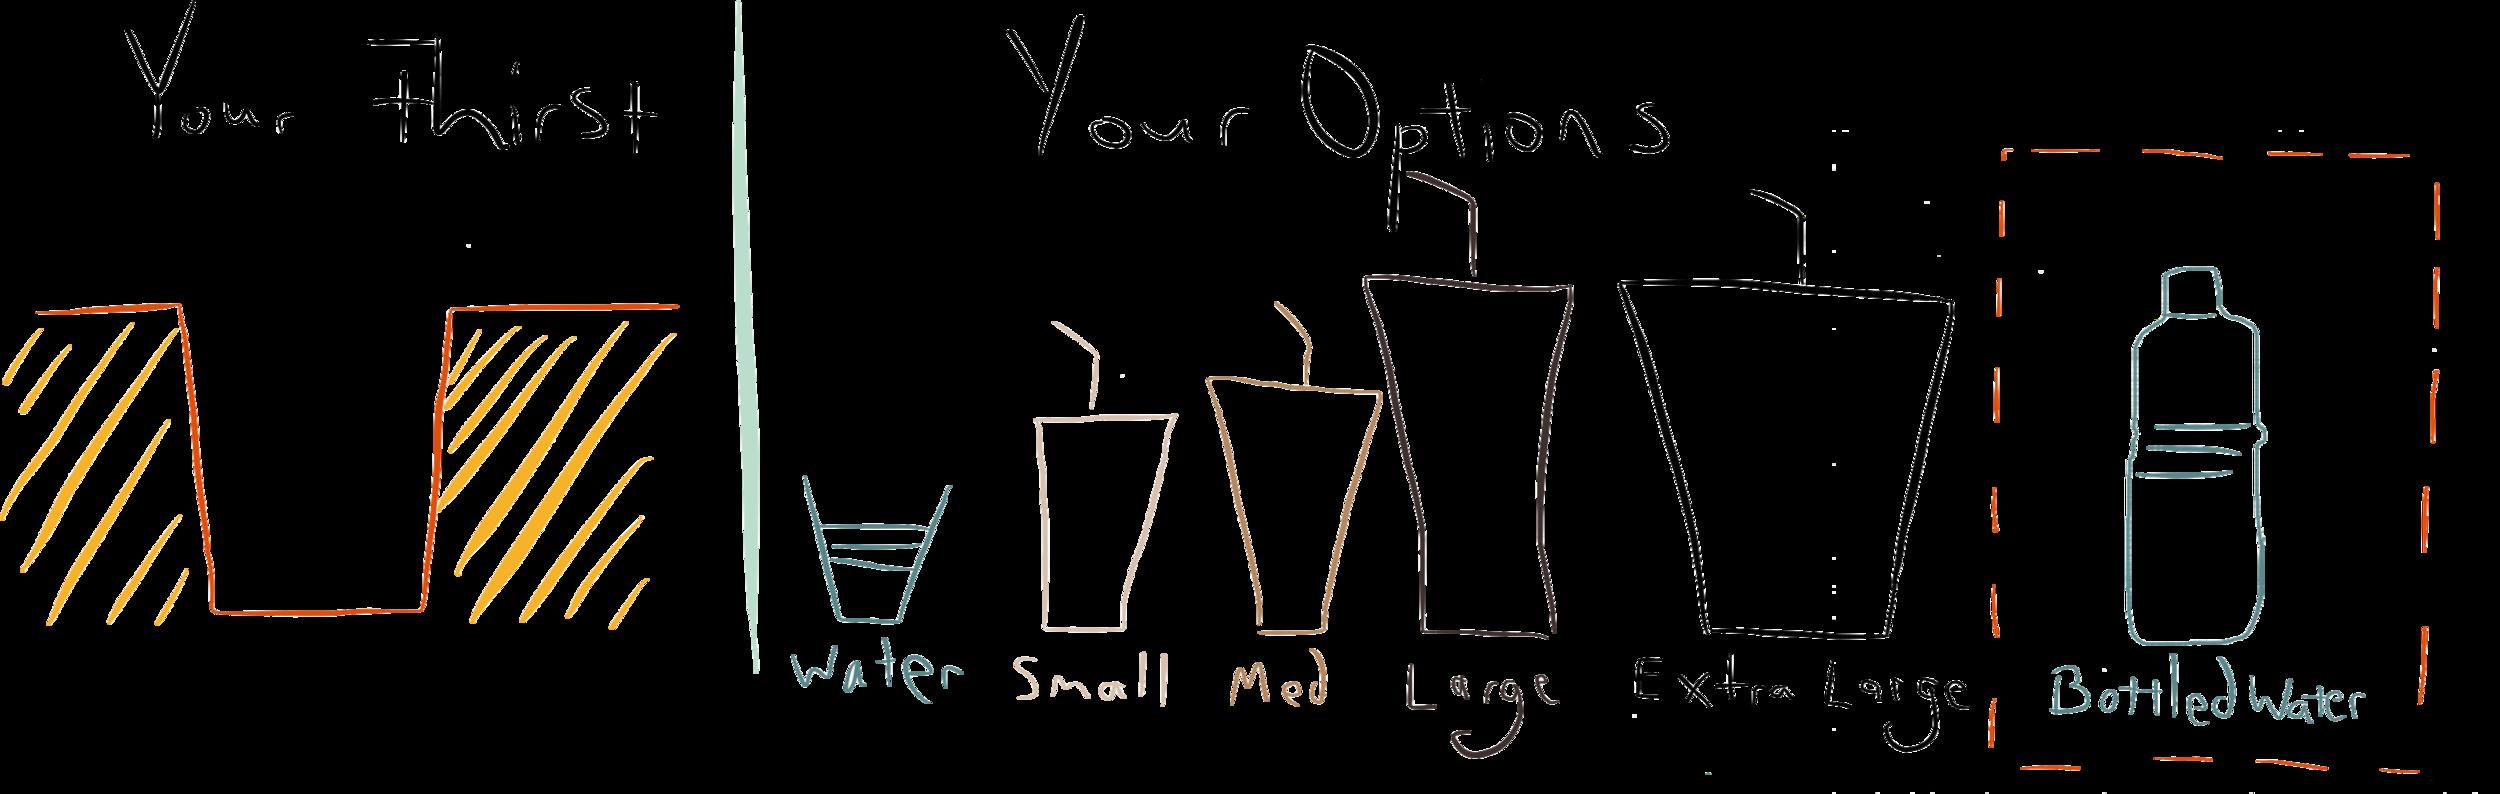 Beverage Options Watered PNG v1.png